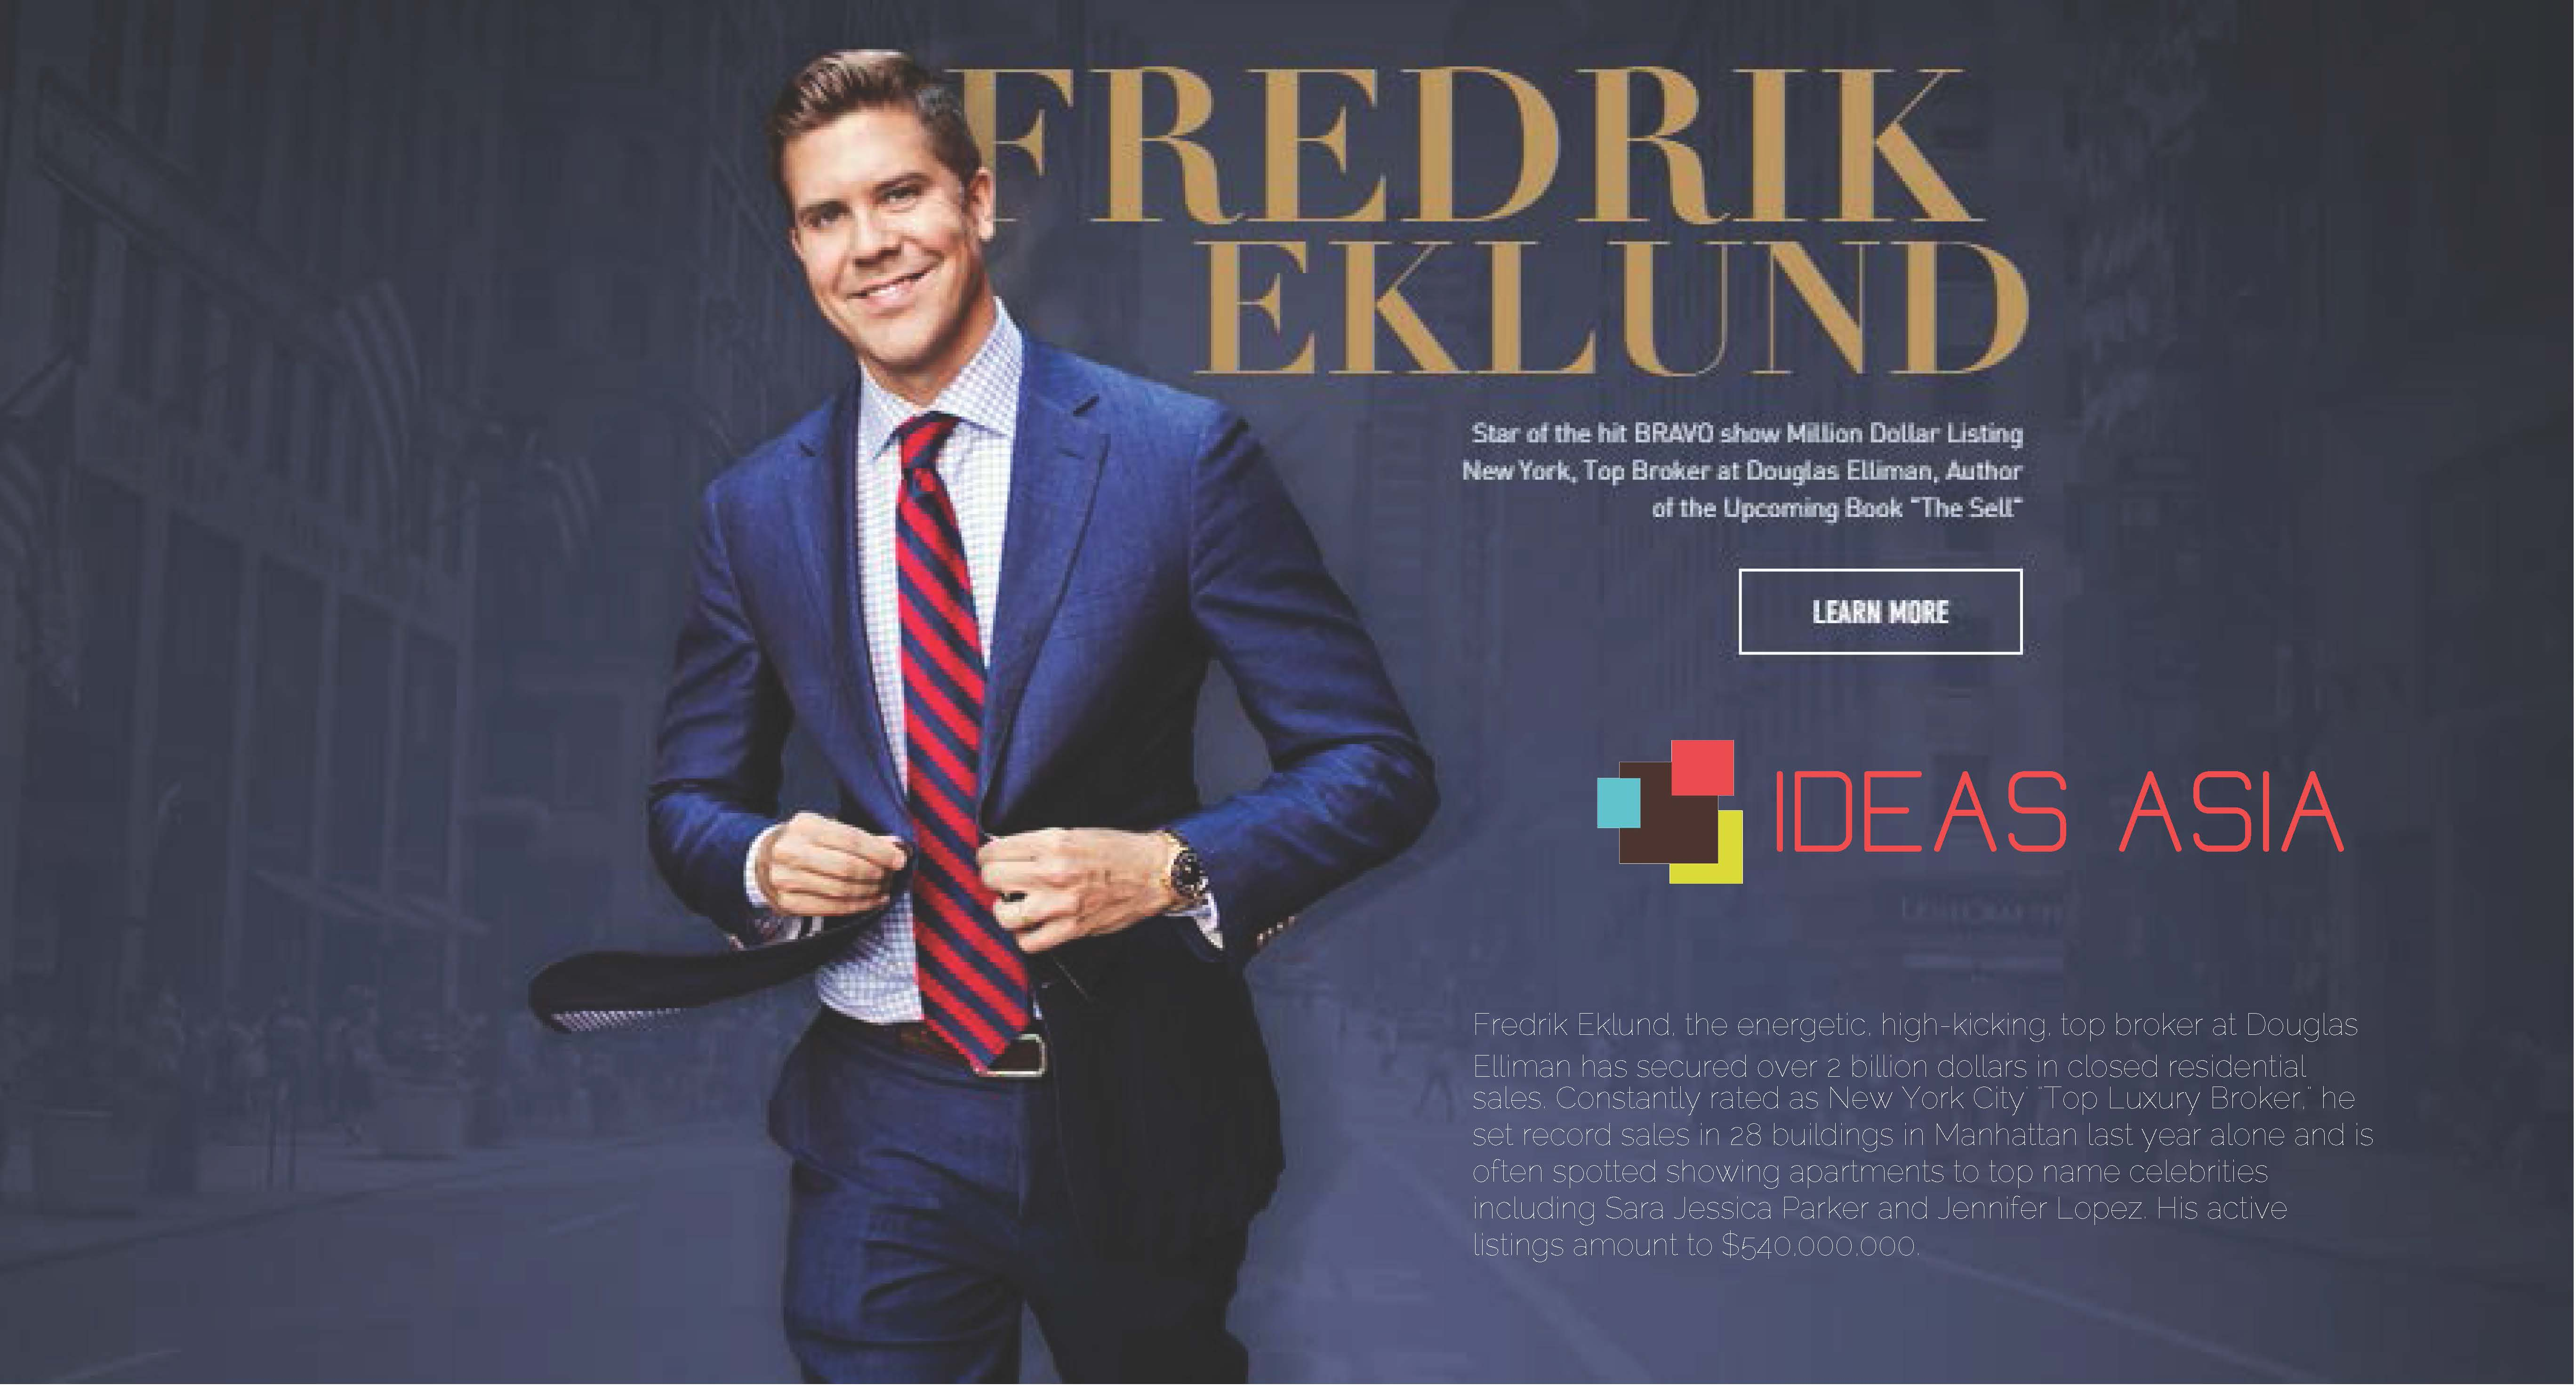 IDEAS ASIA - Fredrik Ekuland